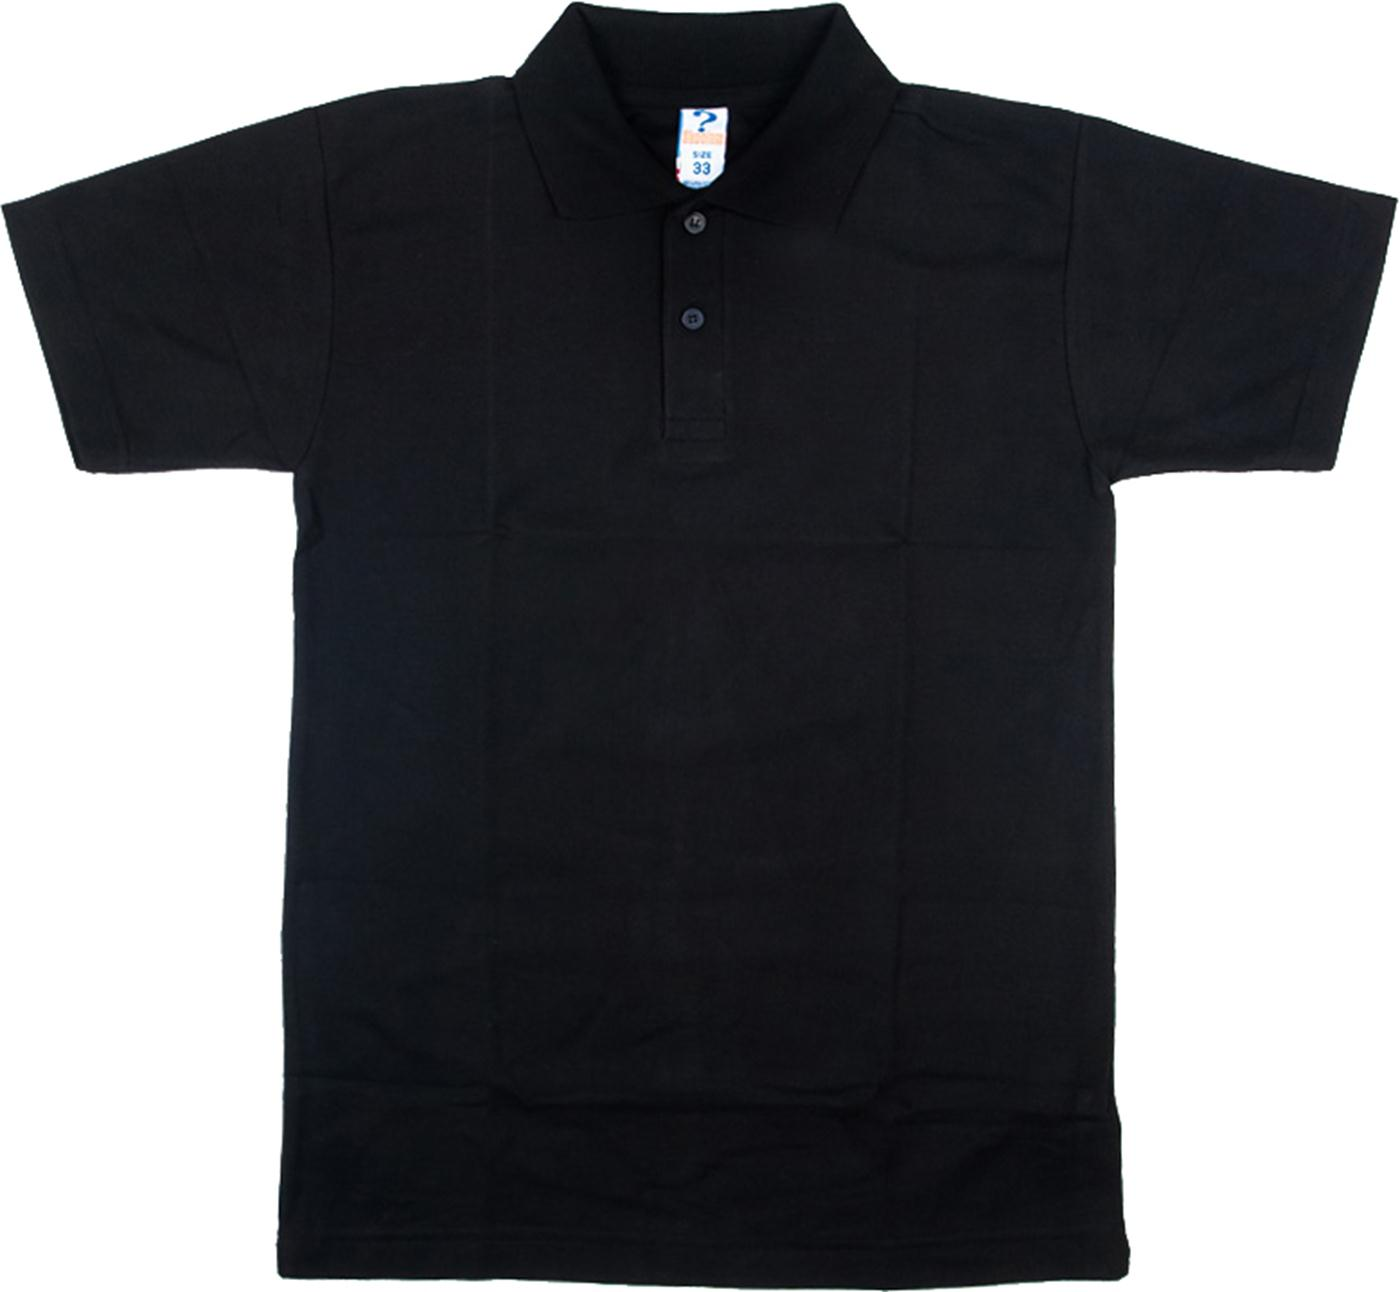 New School Uniform Polo Shirt Top Gym T-Shirt Pack of 2 Sizes 20 ...